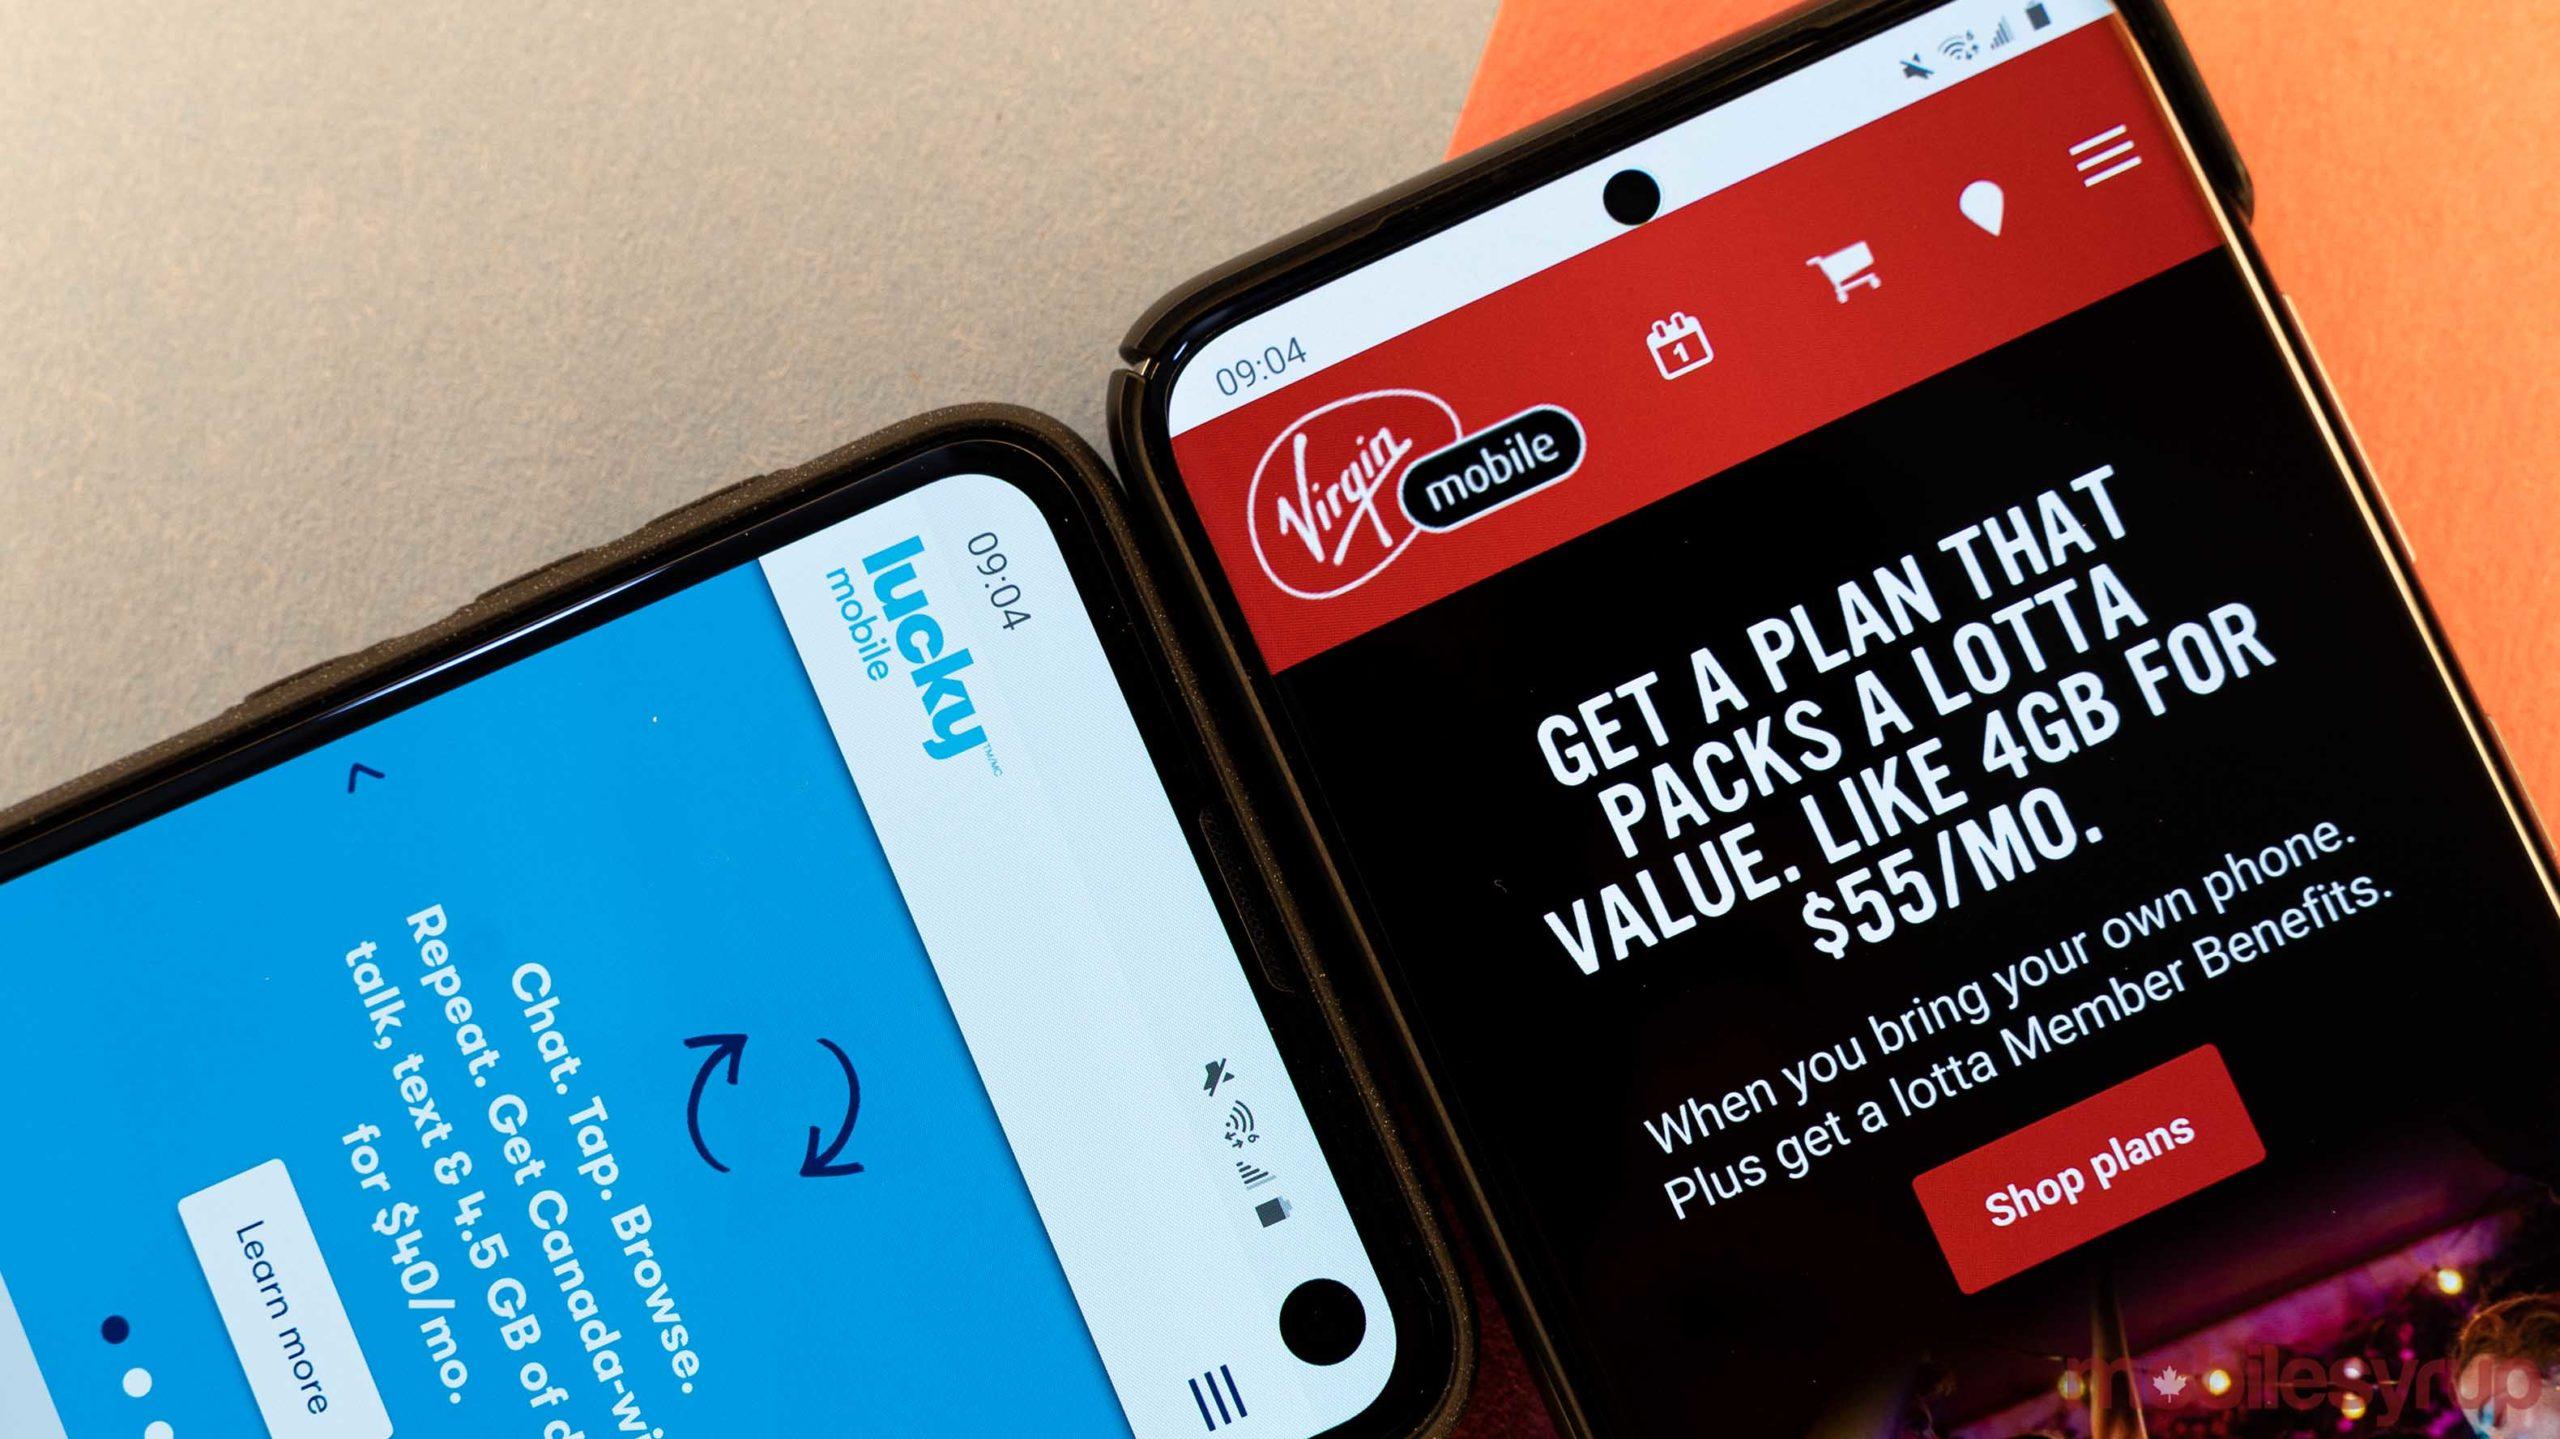 Lucky Mobile and Virigin Mobile websites